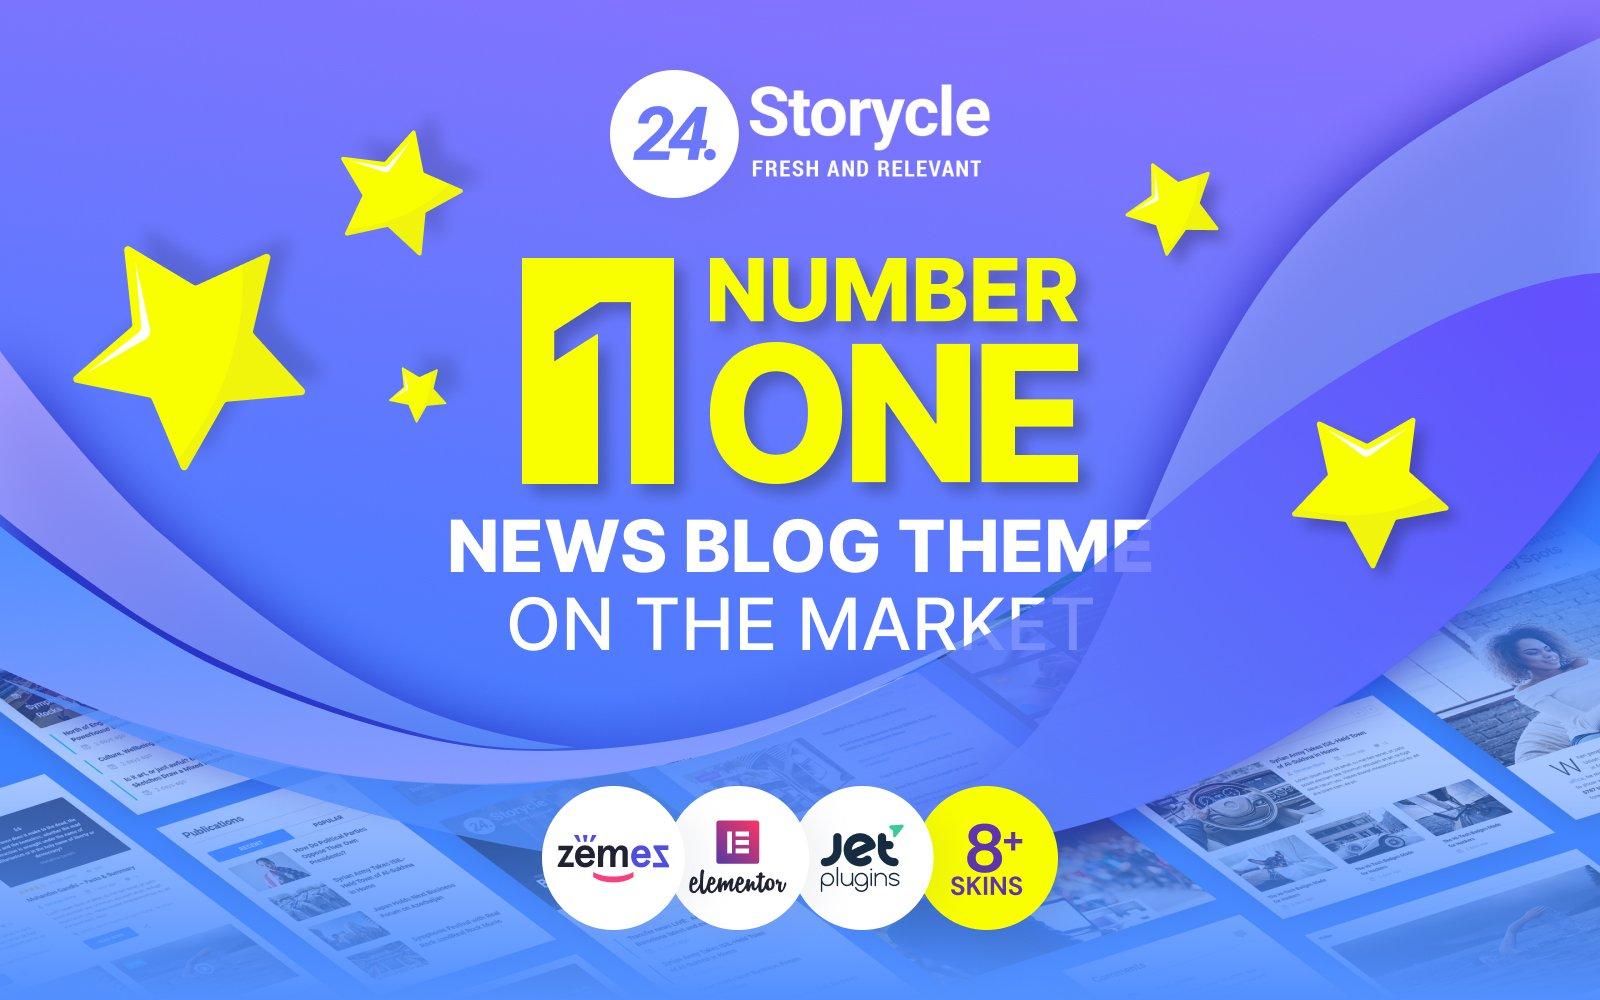 24.Storycle - Multipurpose News Portal WordPress Elementor Theme WordPress Theme